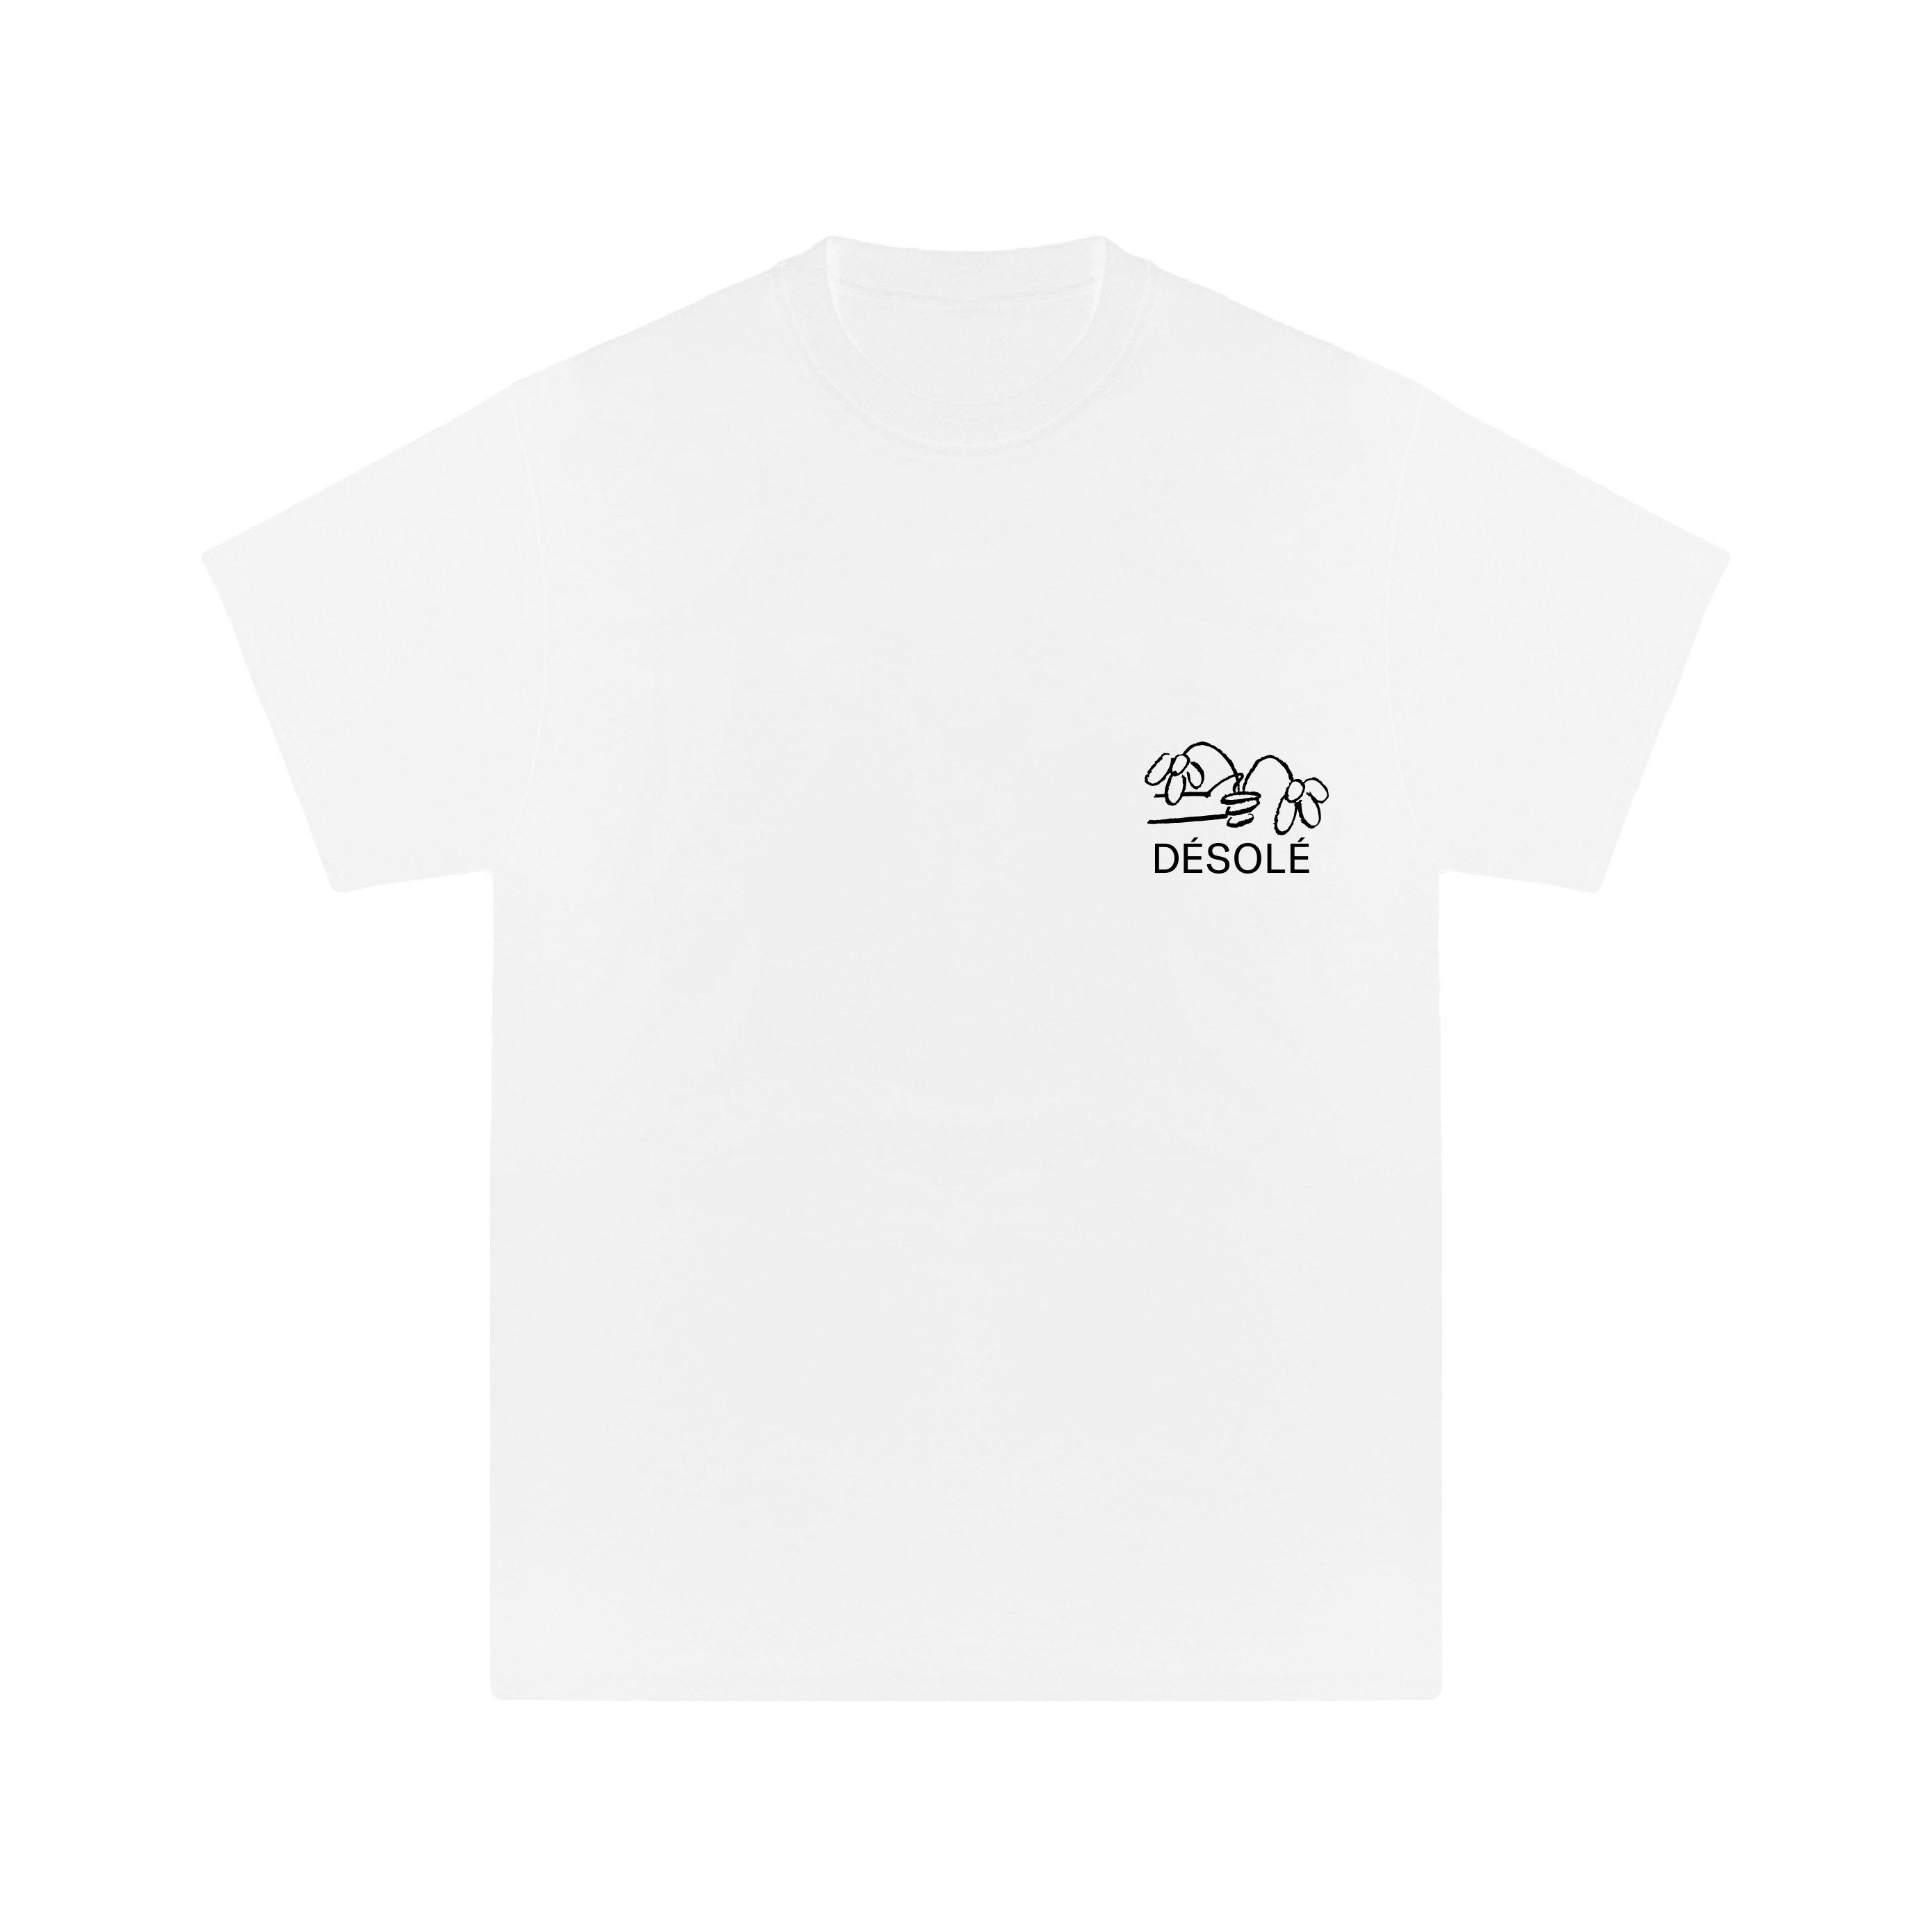 Desole t-shirt design